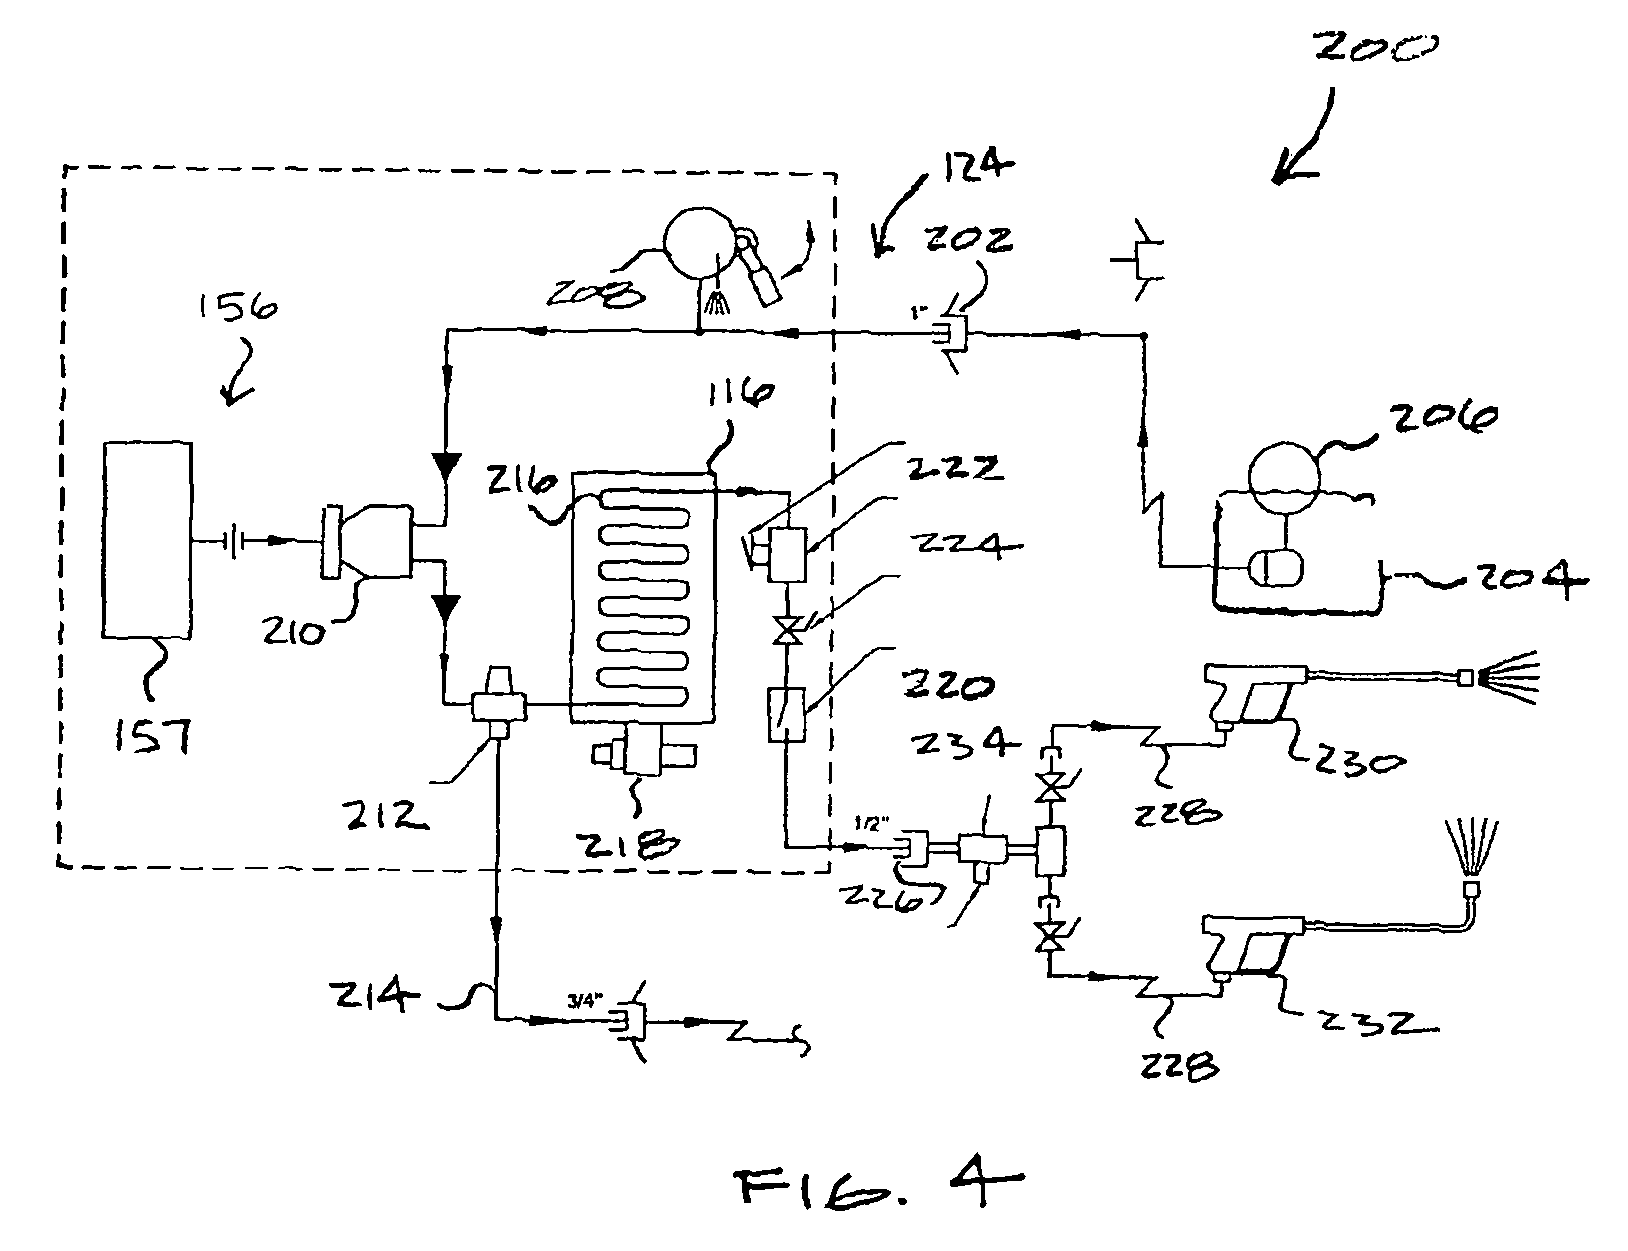 Beckett Adc Burner Wiring Diagram : 33 Wiring Diagram